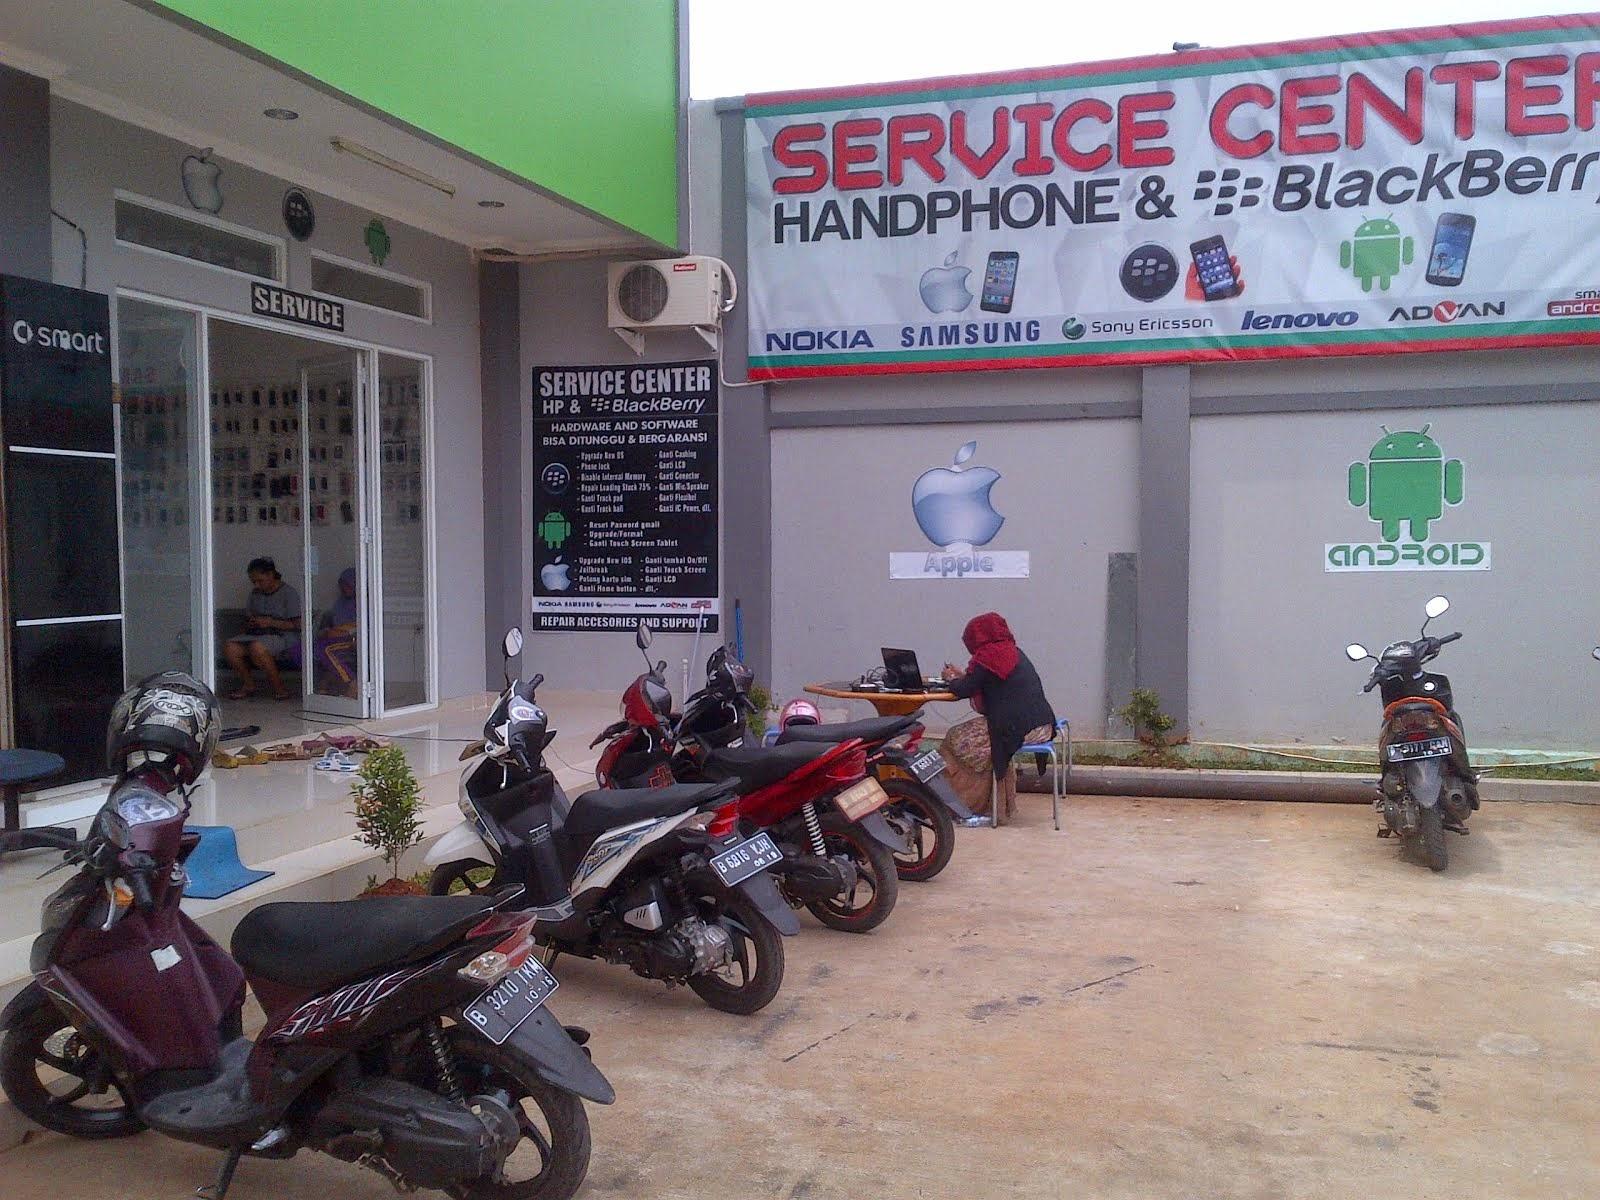 TEMPAT SERVICE